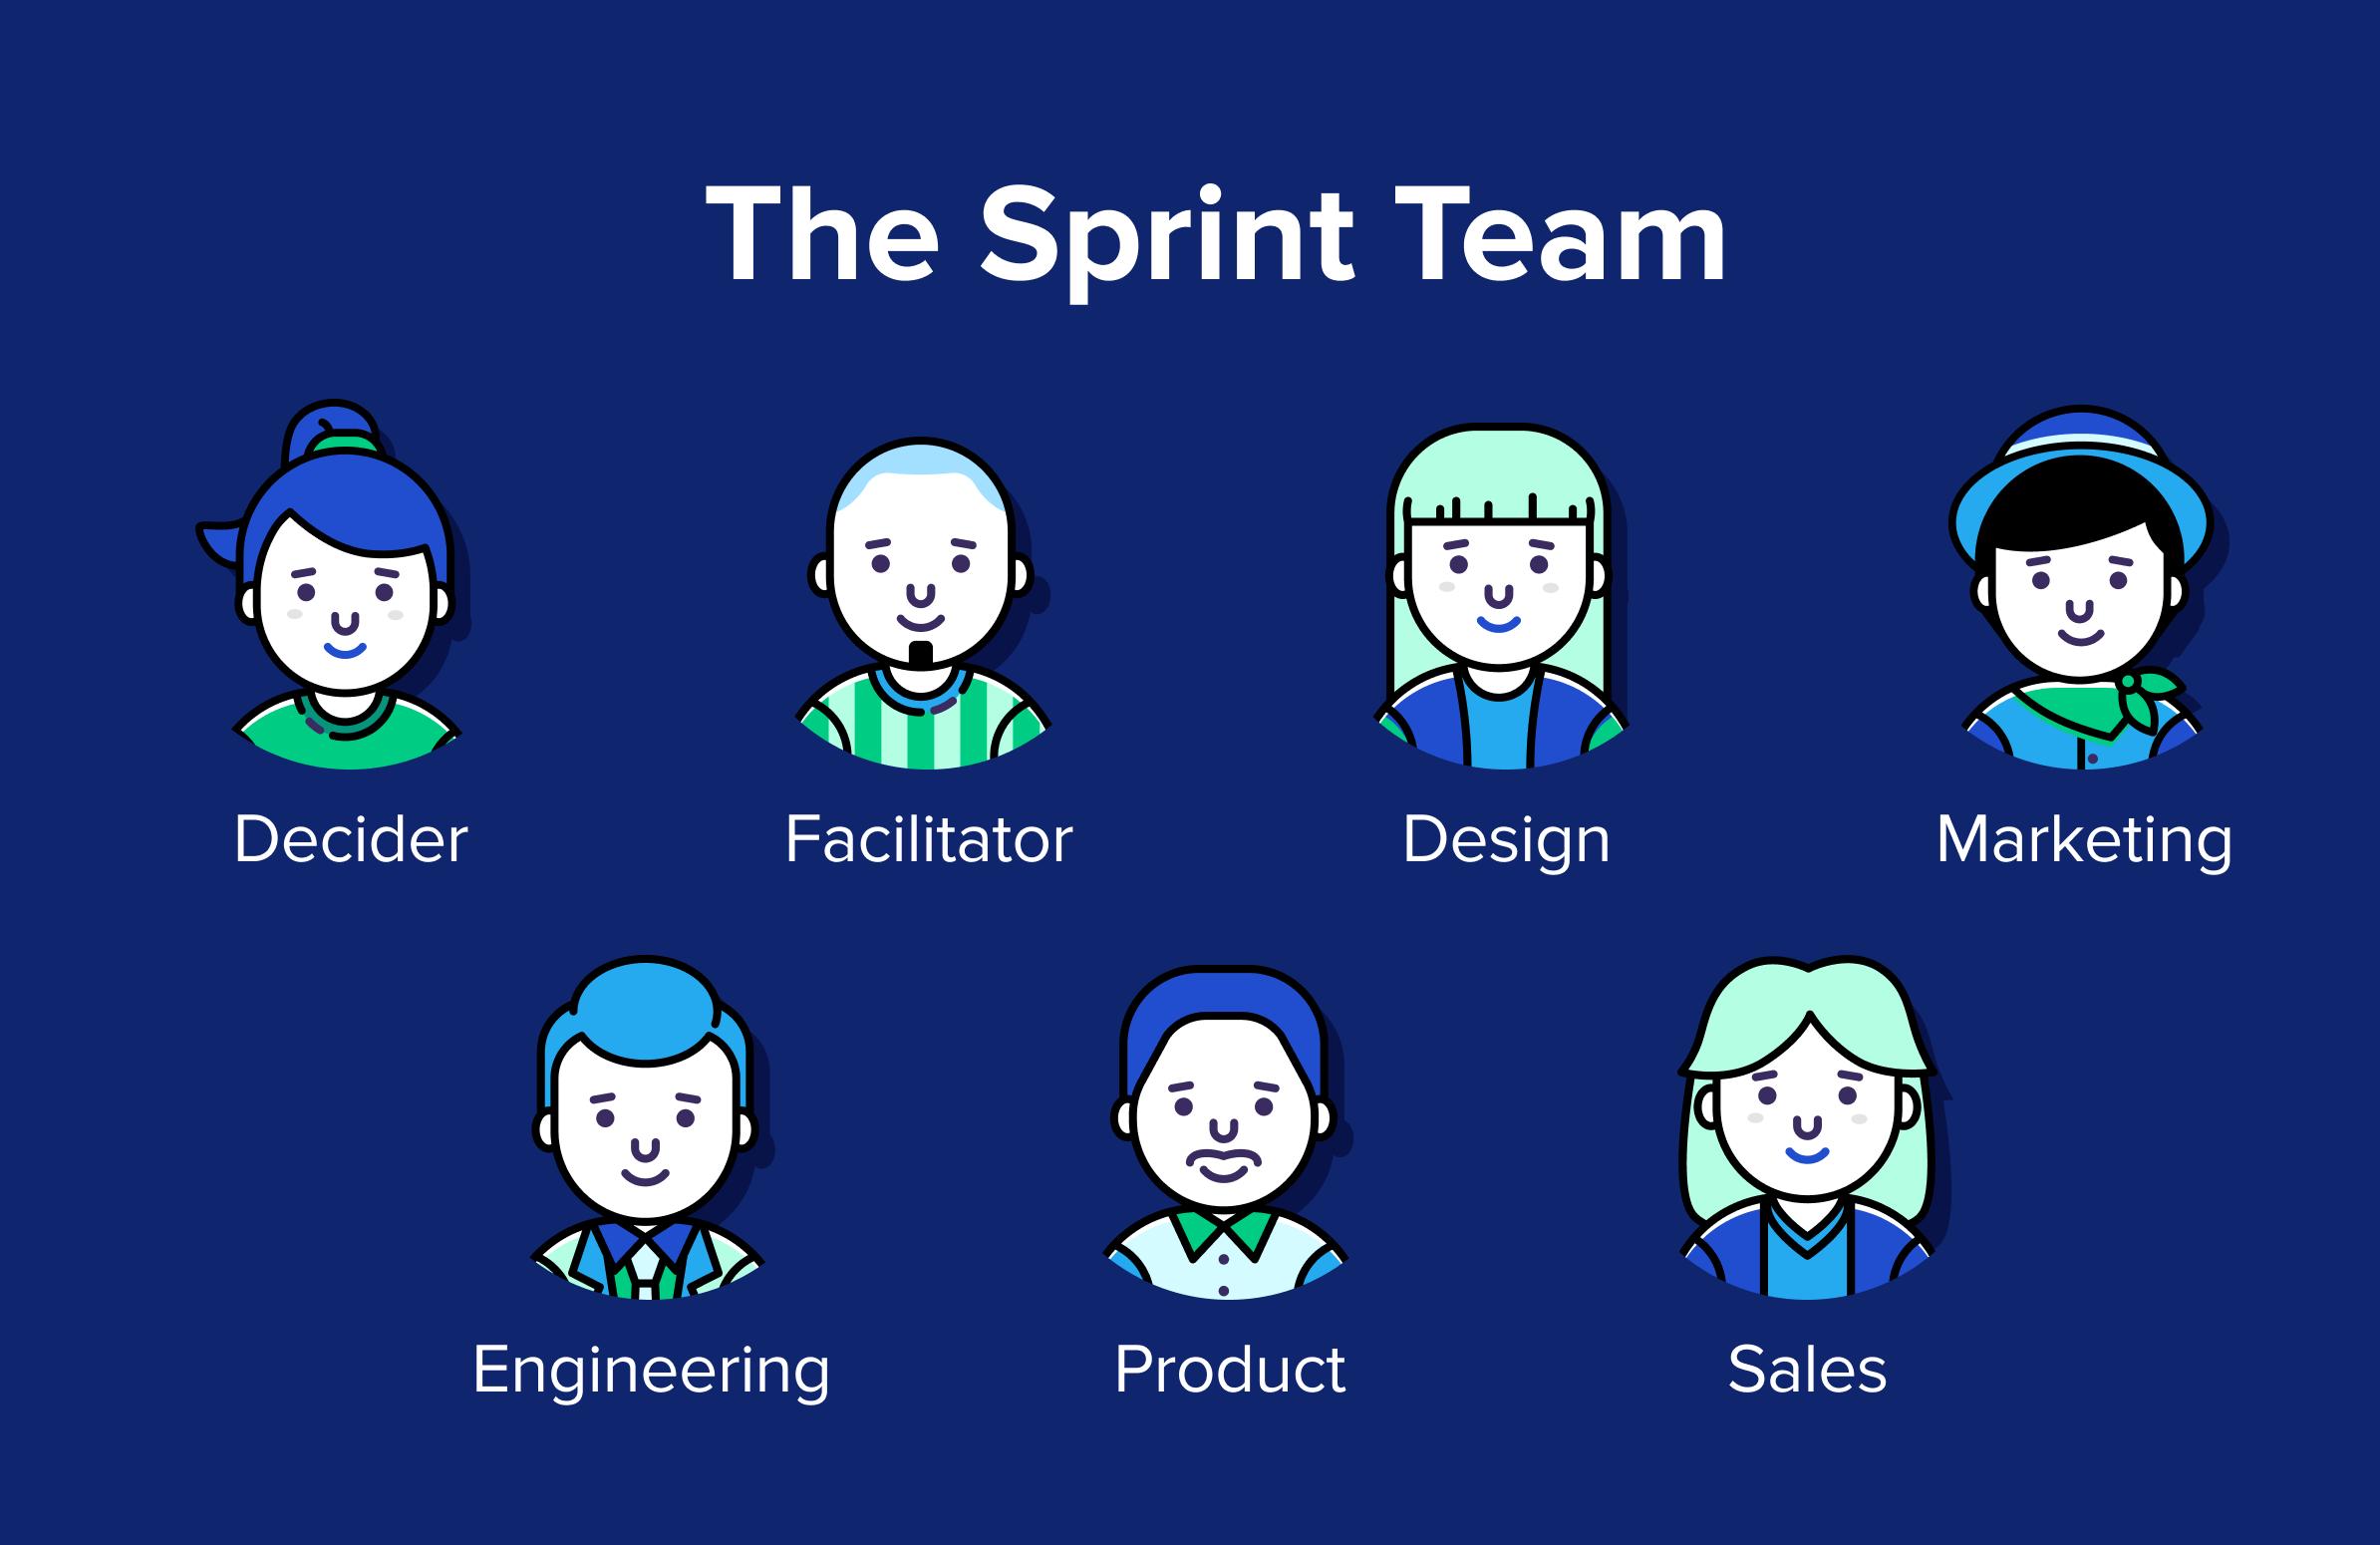 The remote design sprint team